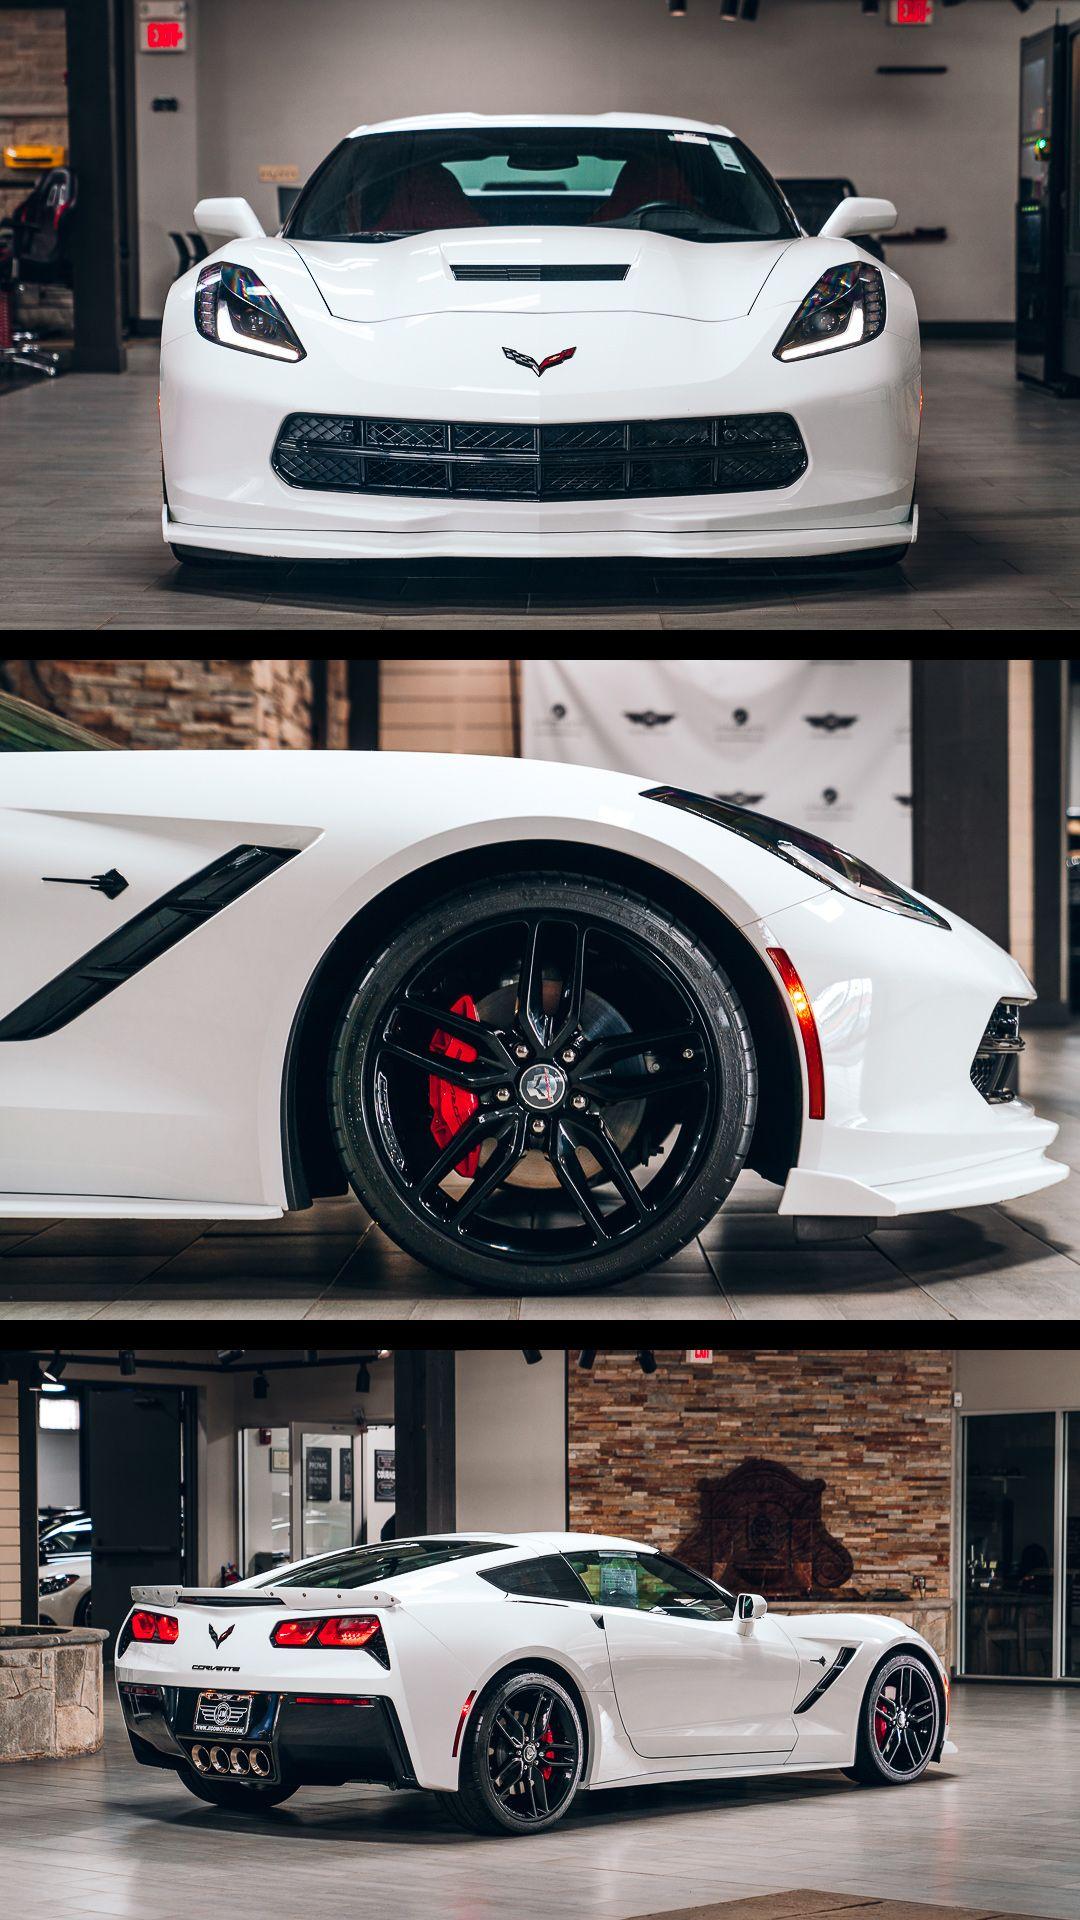 2016 Chevrolet Corvette Stingray 2lt With Only 11k Miles Carbon